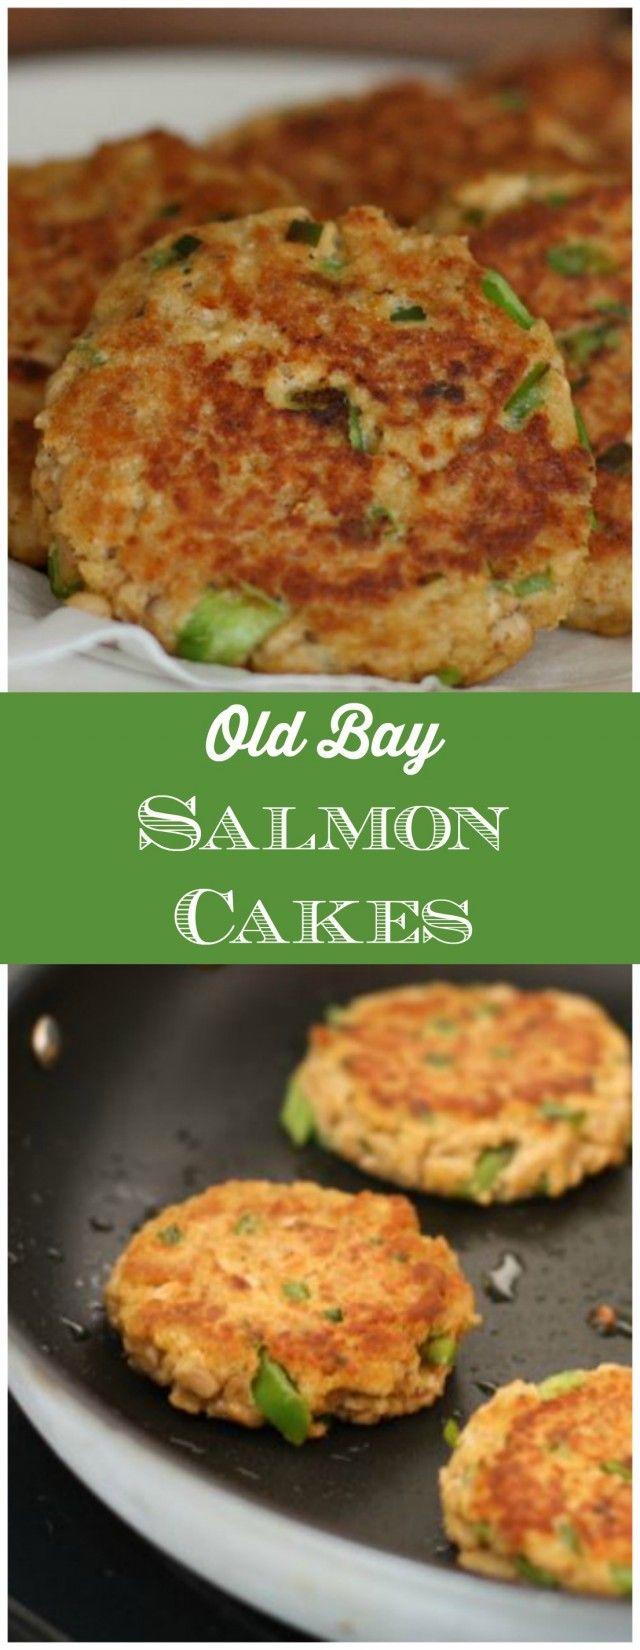 Old Bay Salmon Cakes Recipe Recipes To Cook Salmon